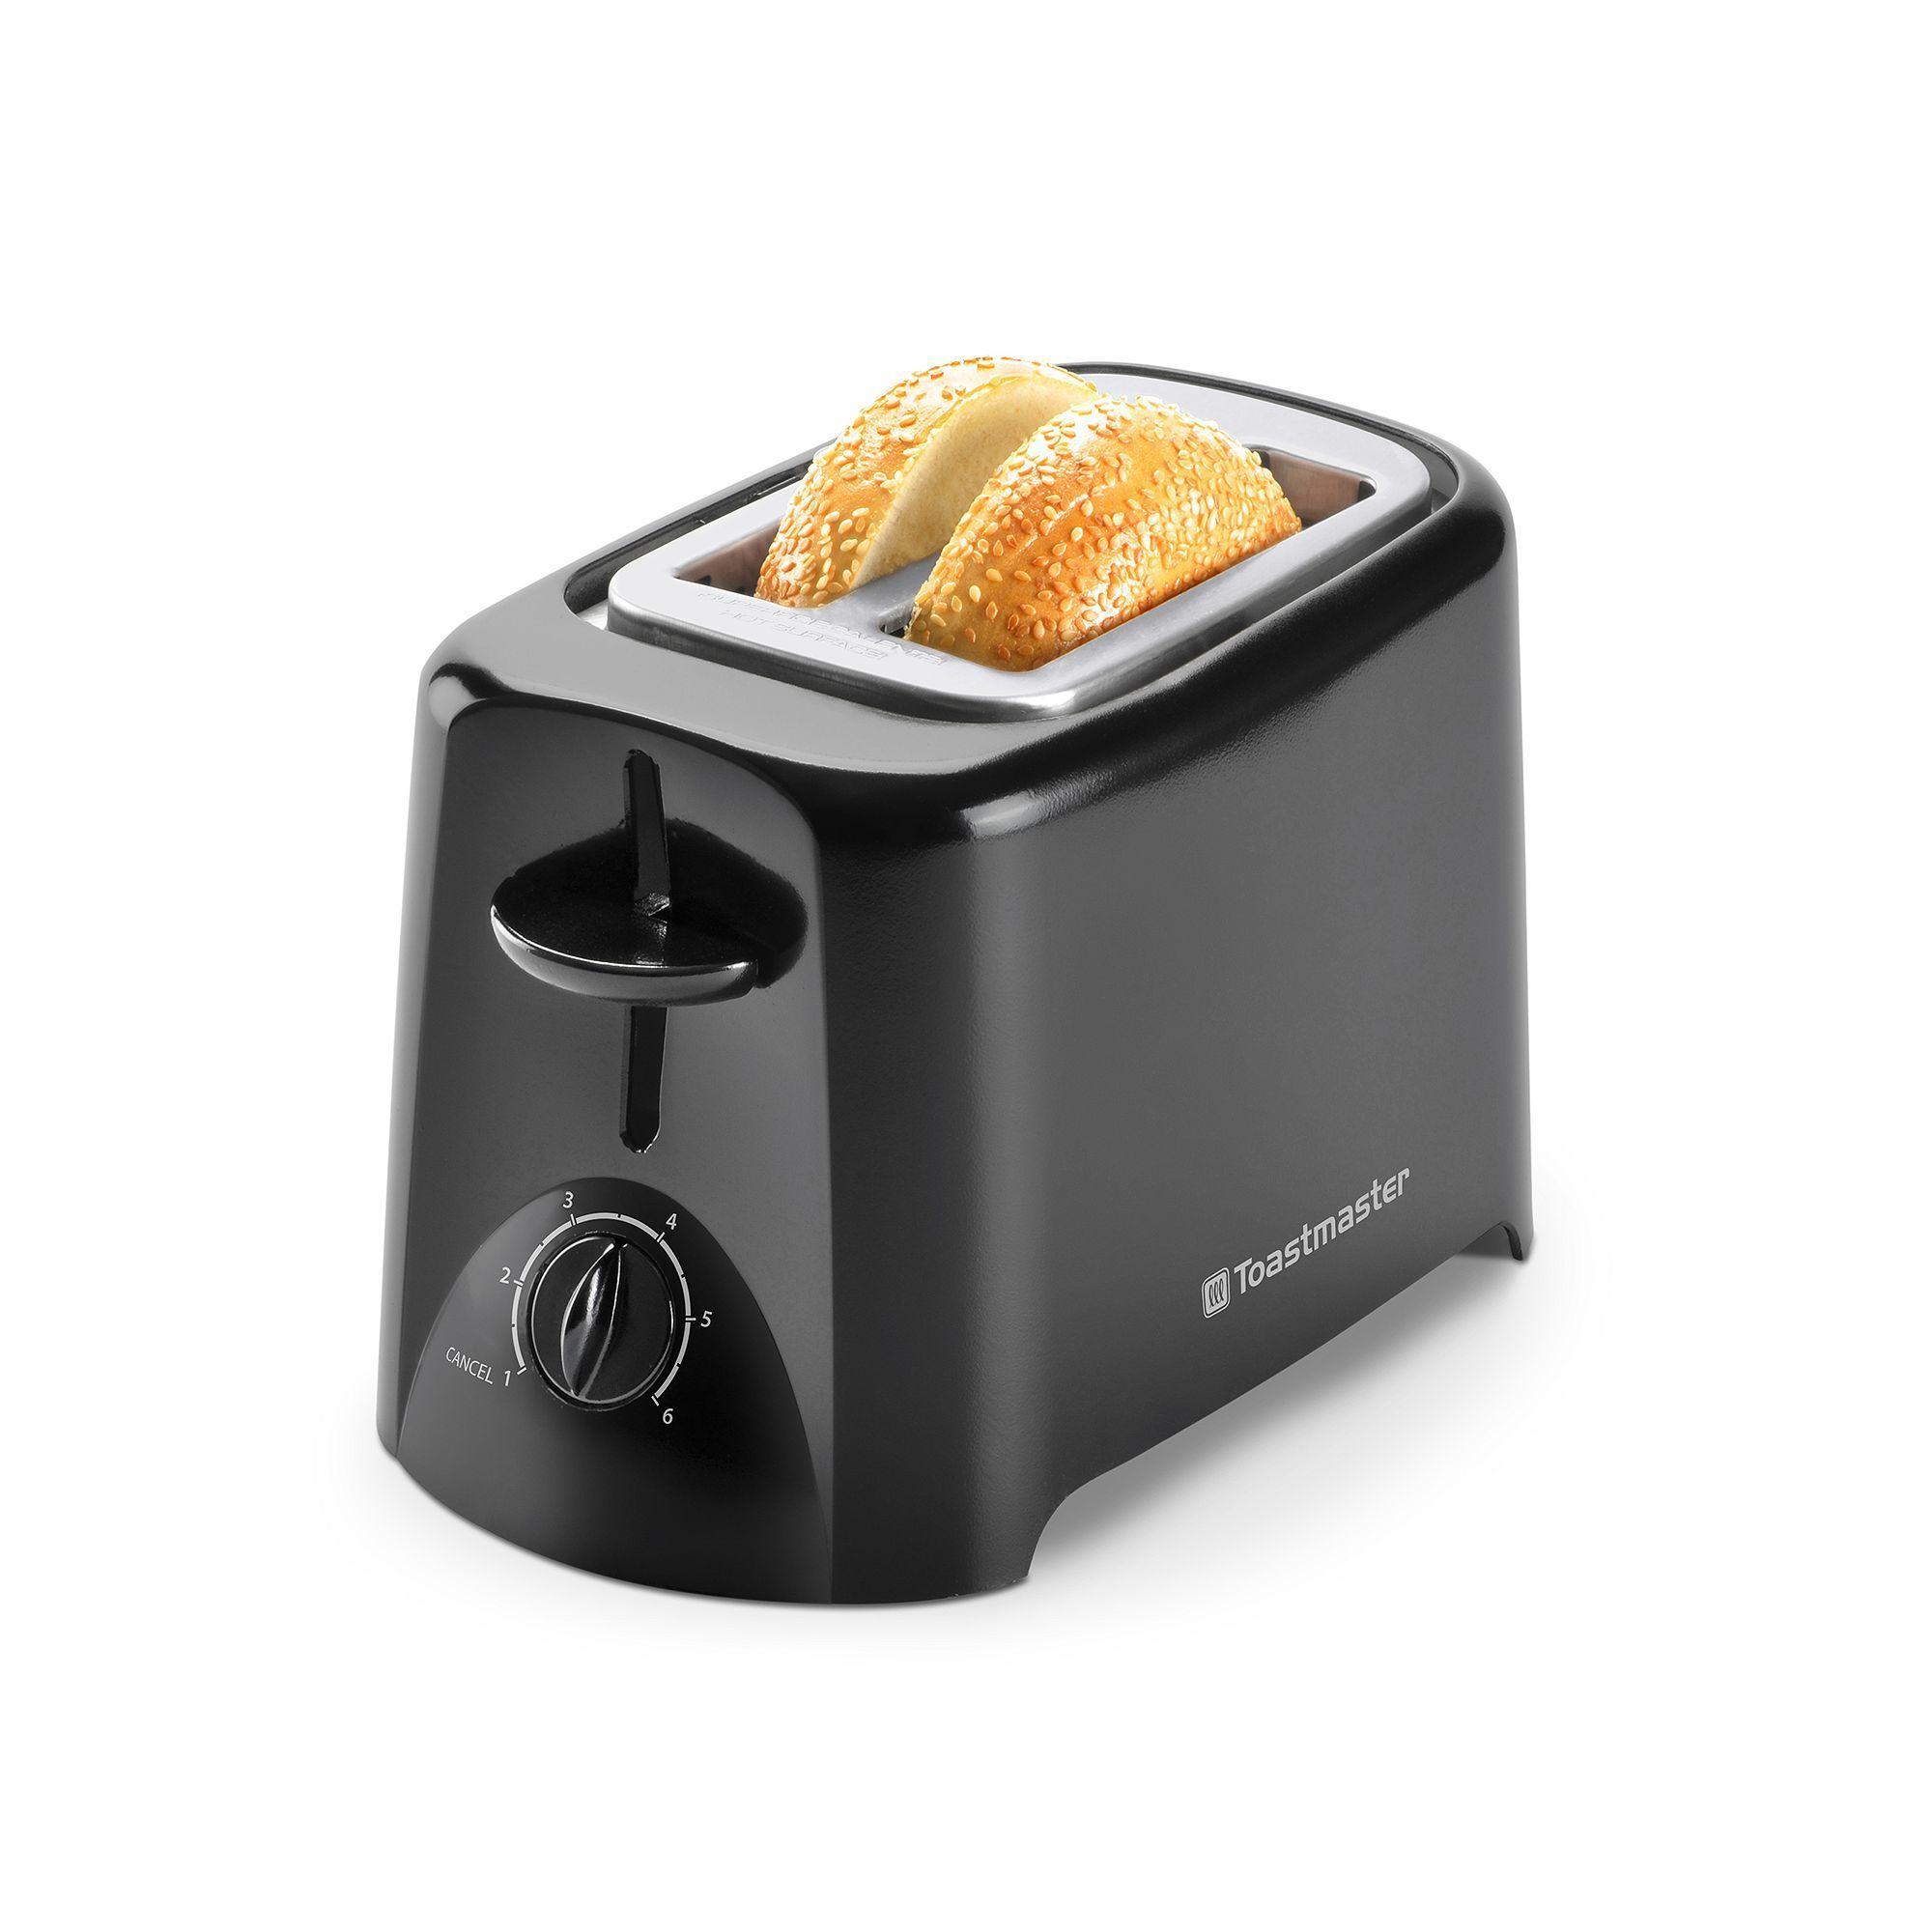 Uncategorized Toastmaster Kitchen Appliances toastmaster 2 slice toaster black toasters and products kitchens